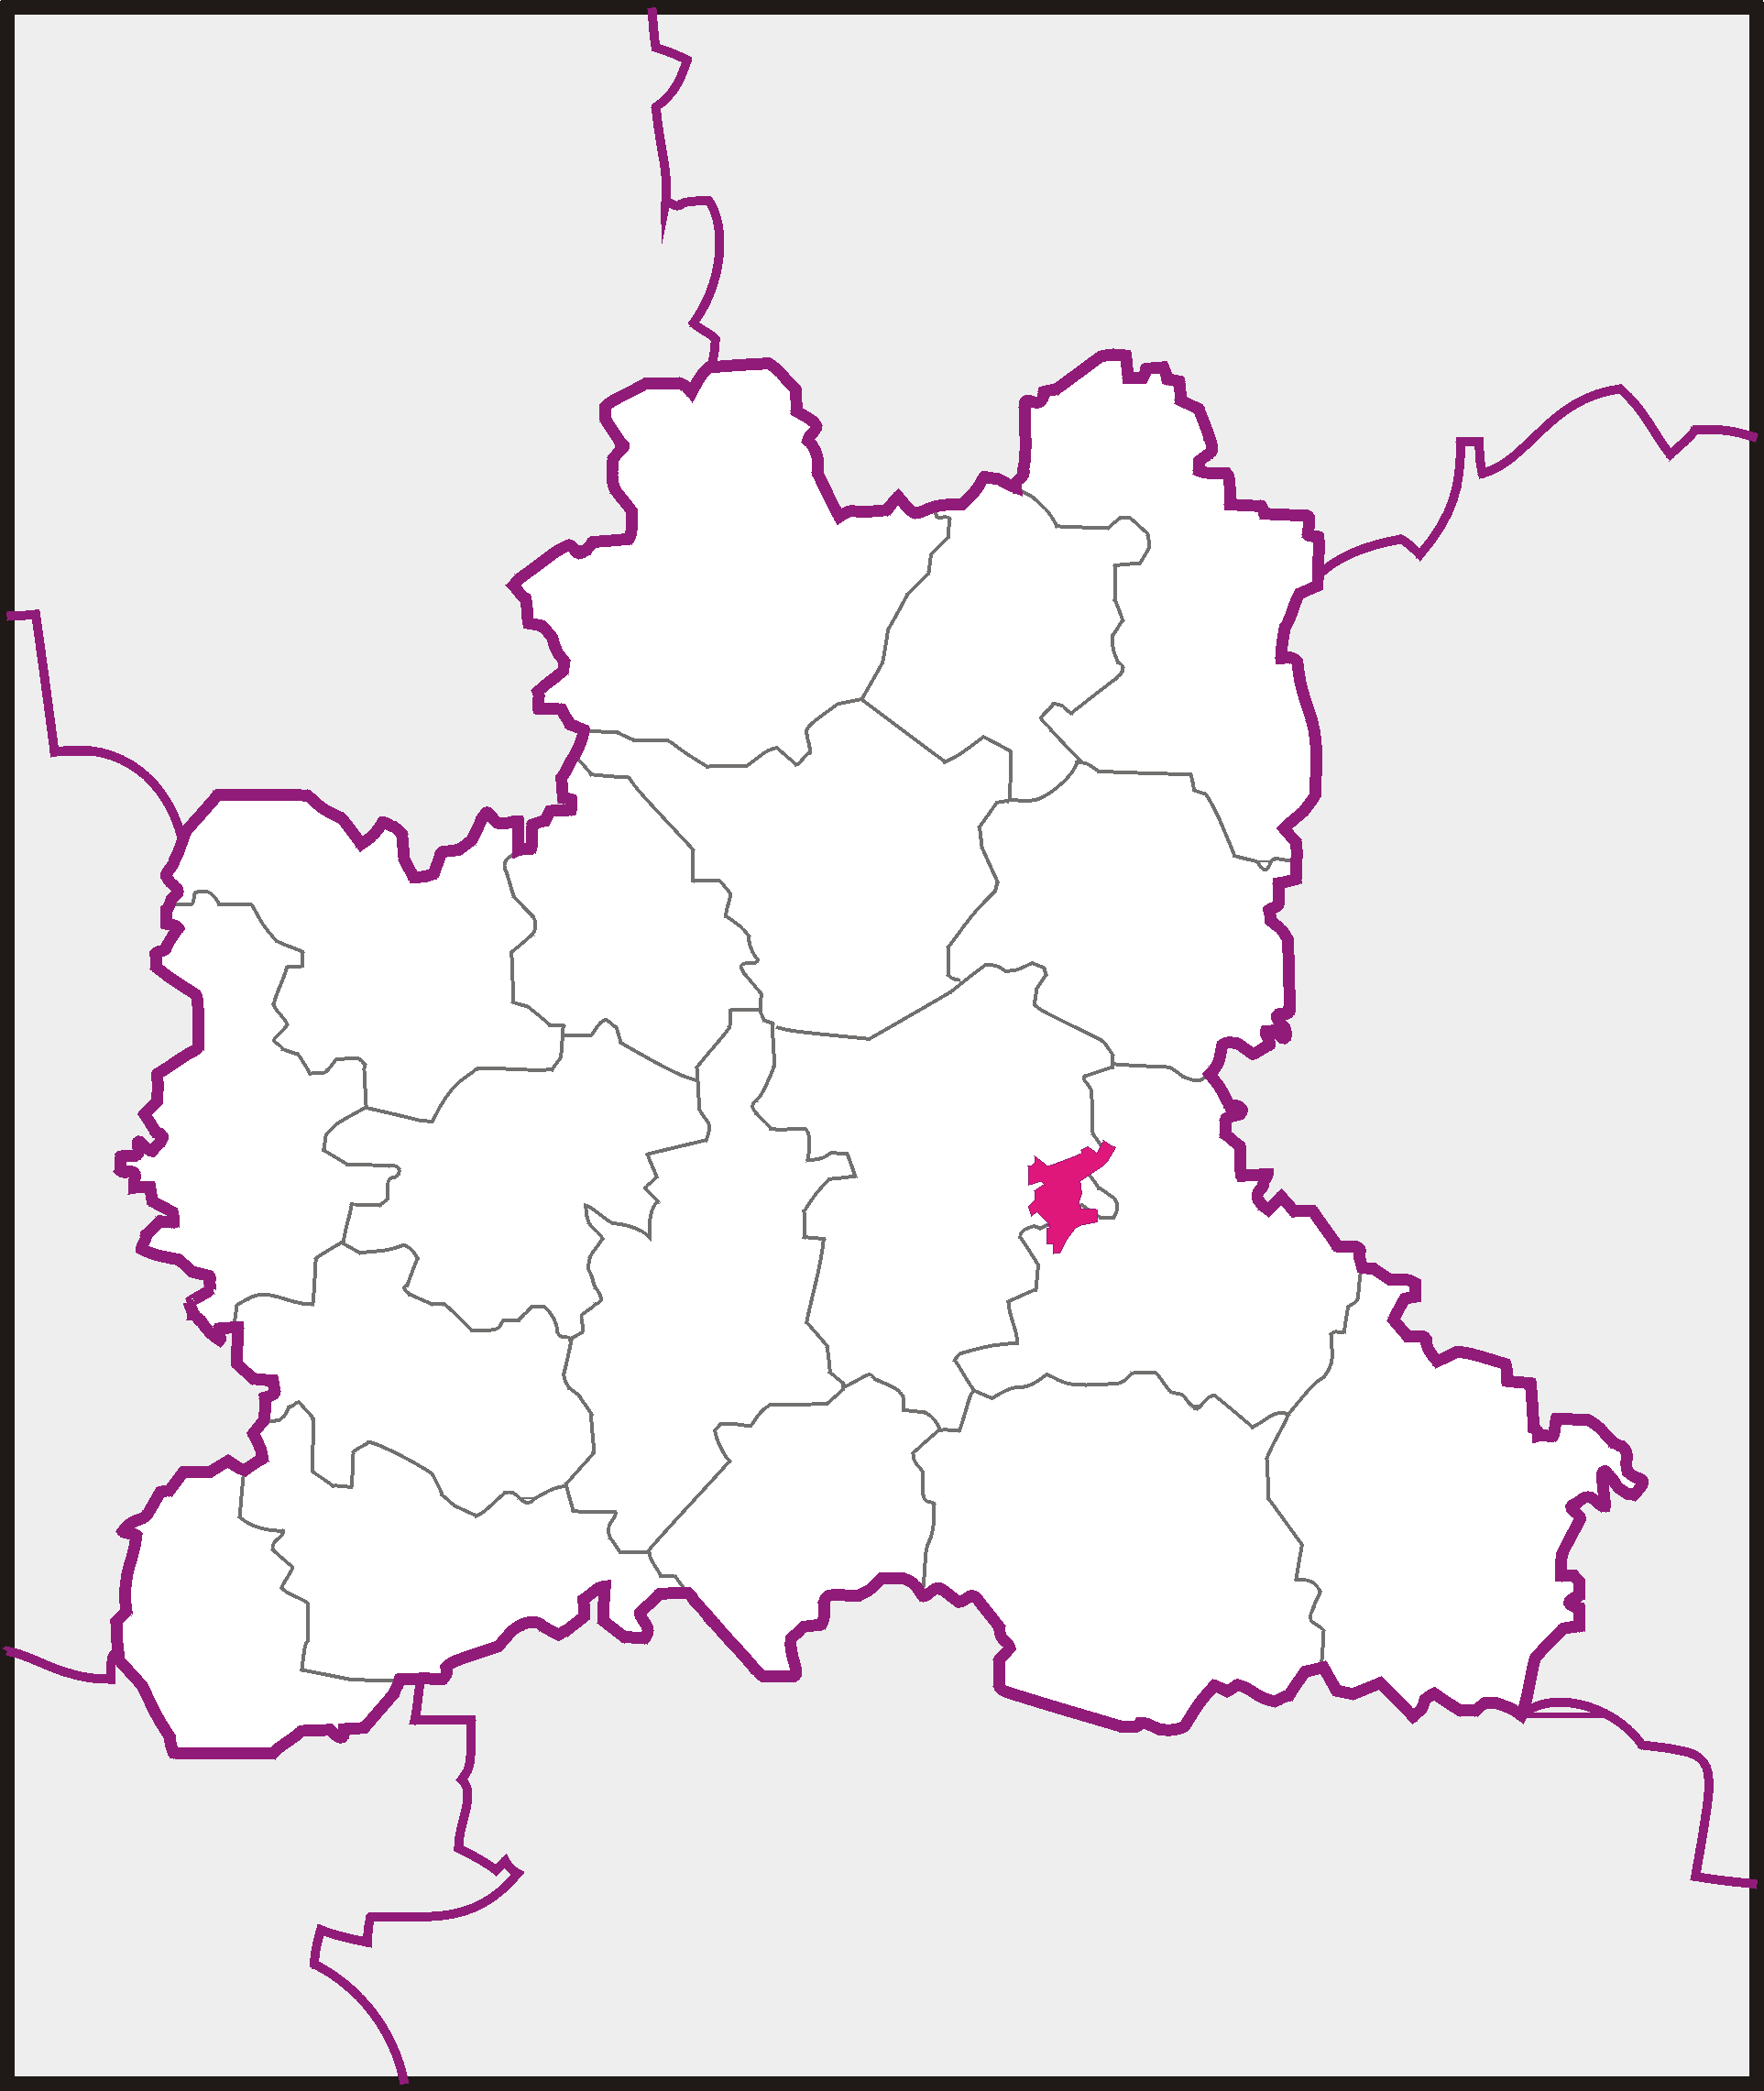 FileLipetsklocation mappng Wikimedia Commons